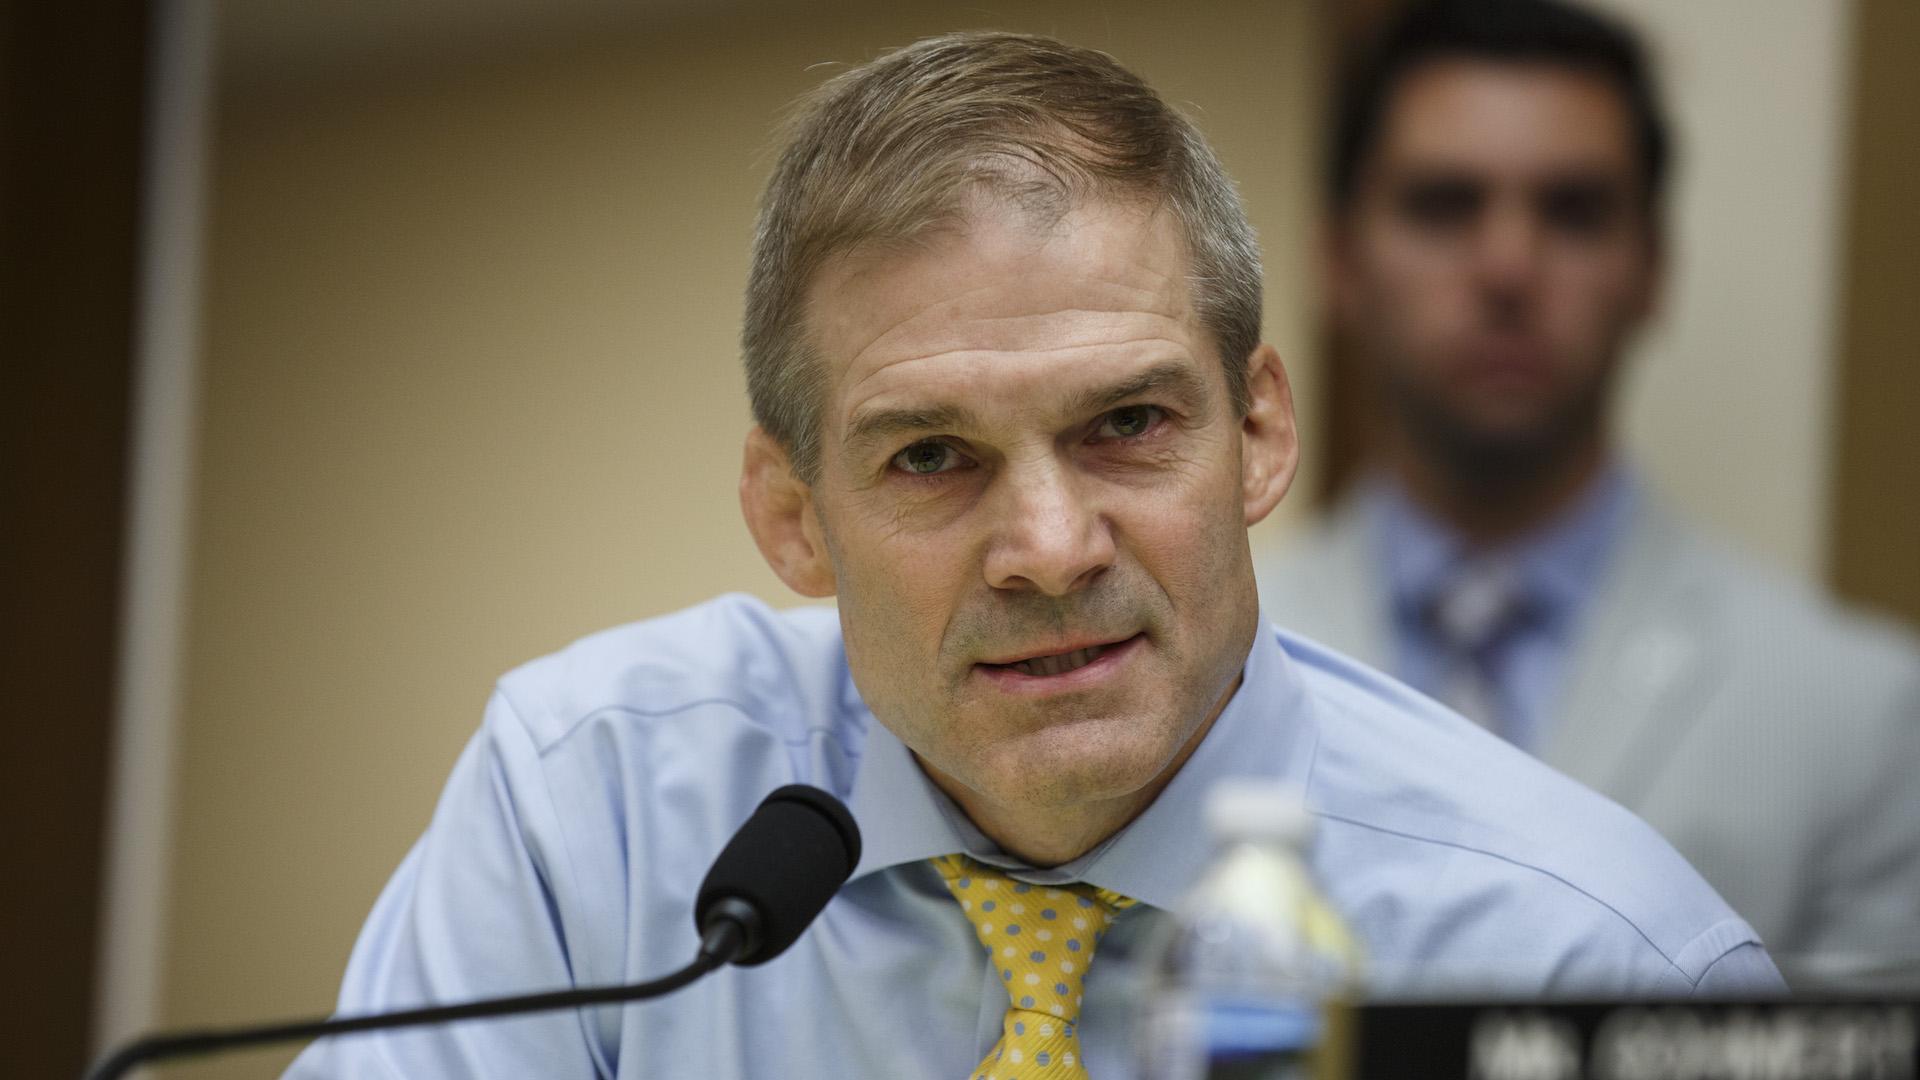 What the Jim Jordan scandal tells us about GOP morality